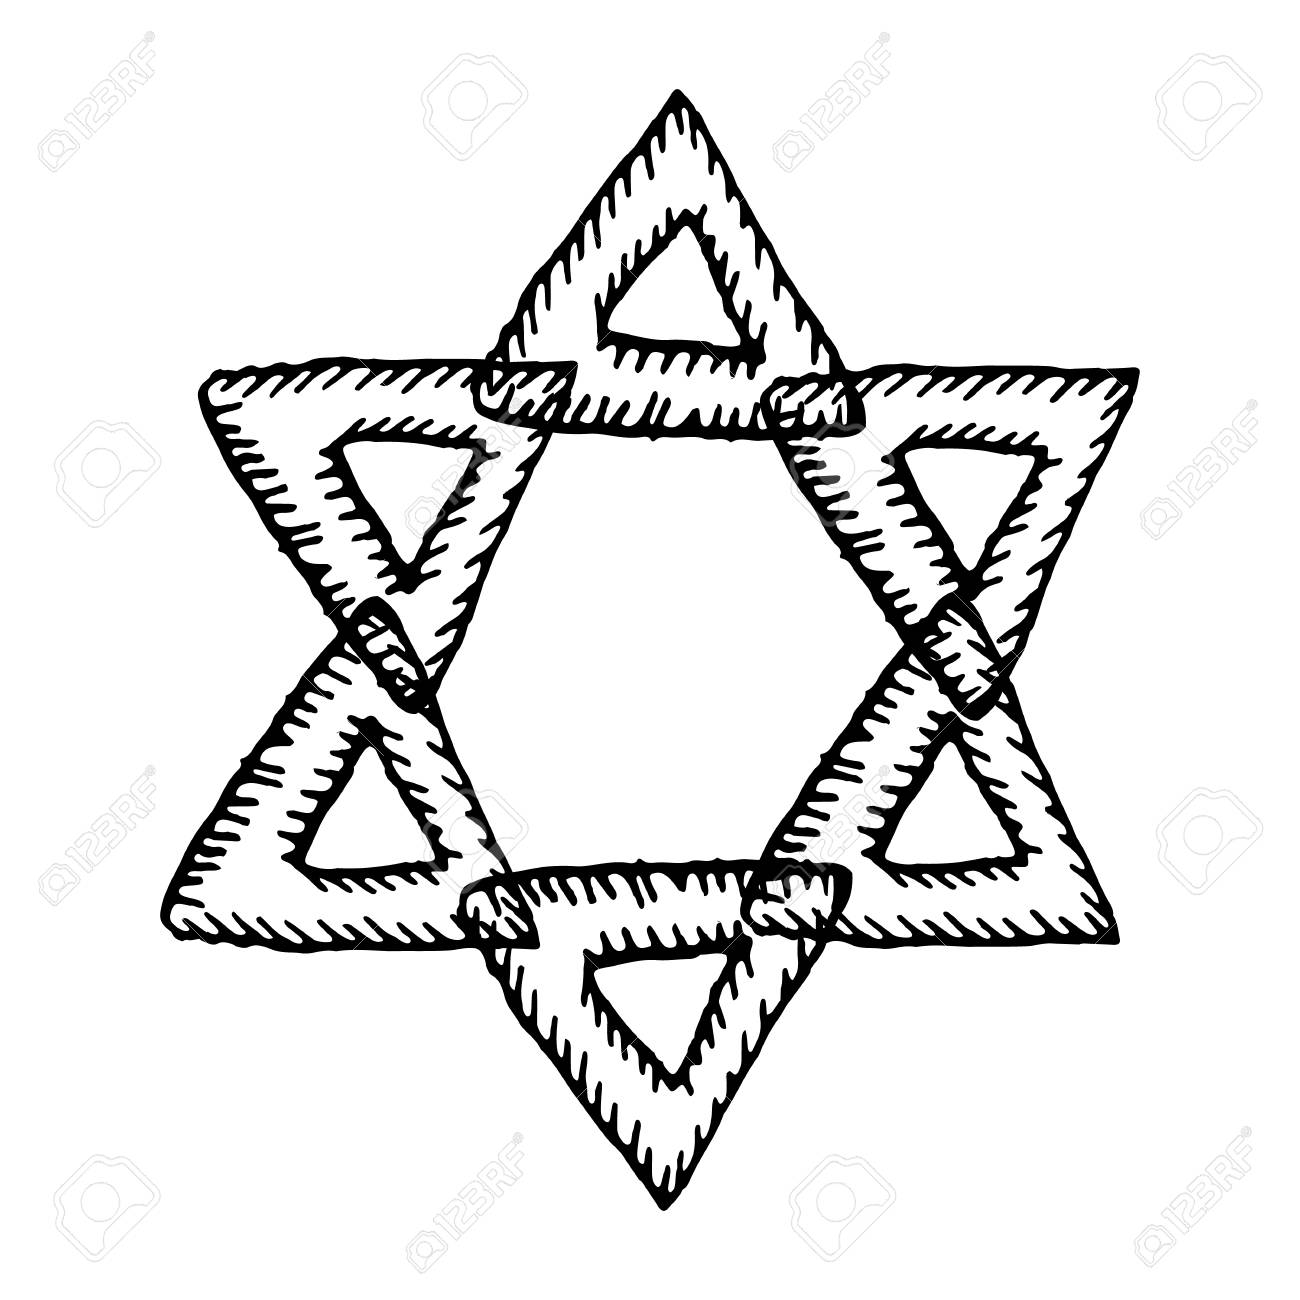 The six pointed star of david the jewish sign hand draw doodle the jewish sign hand draw doodle biocorpaavc Choice Image